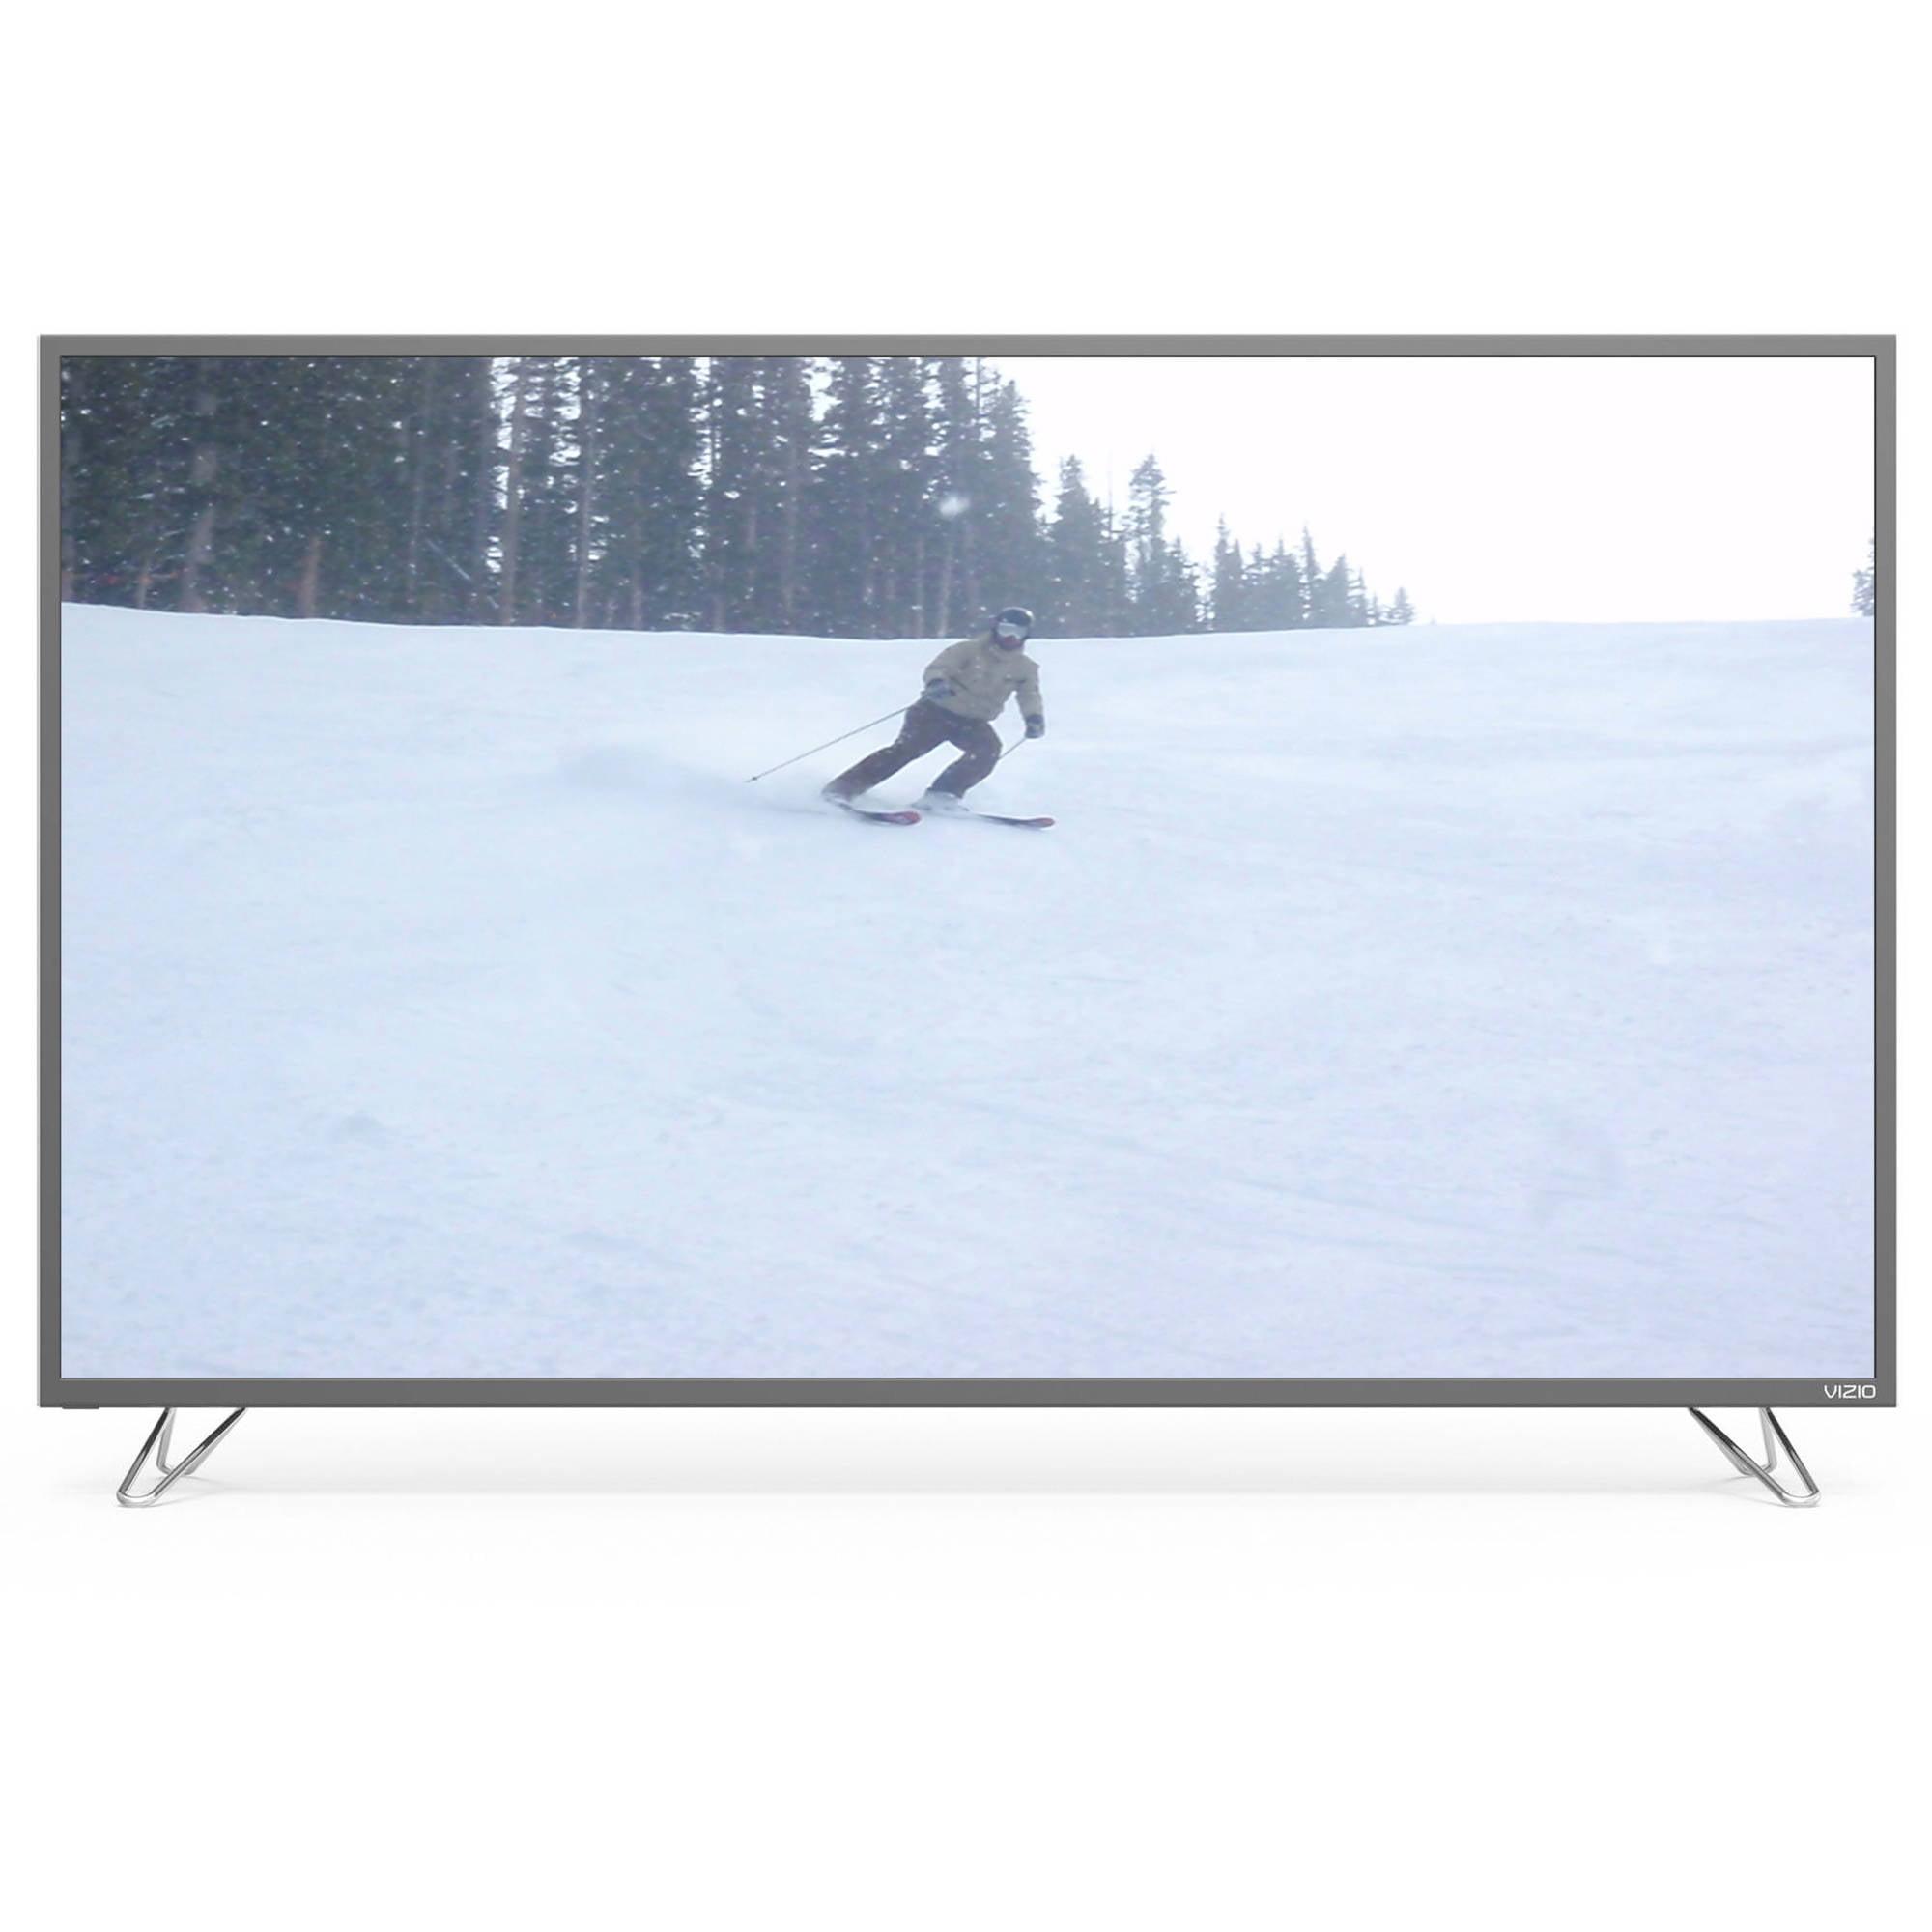 Refurbished VIZIO SmartCast 70 Class M - Series  -  4K Ultra HD, Smart, LED Home Theater Display  -  2160p, 240Hz (M70 - D3)